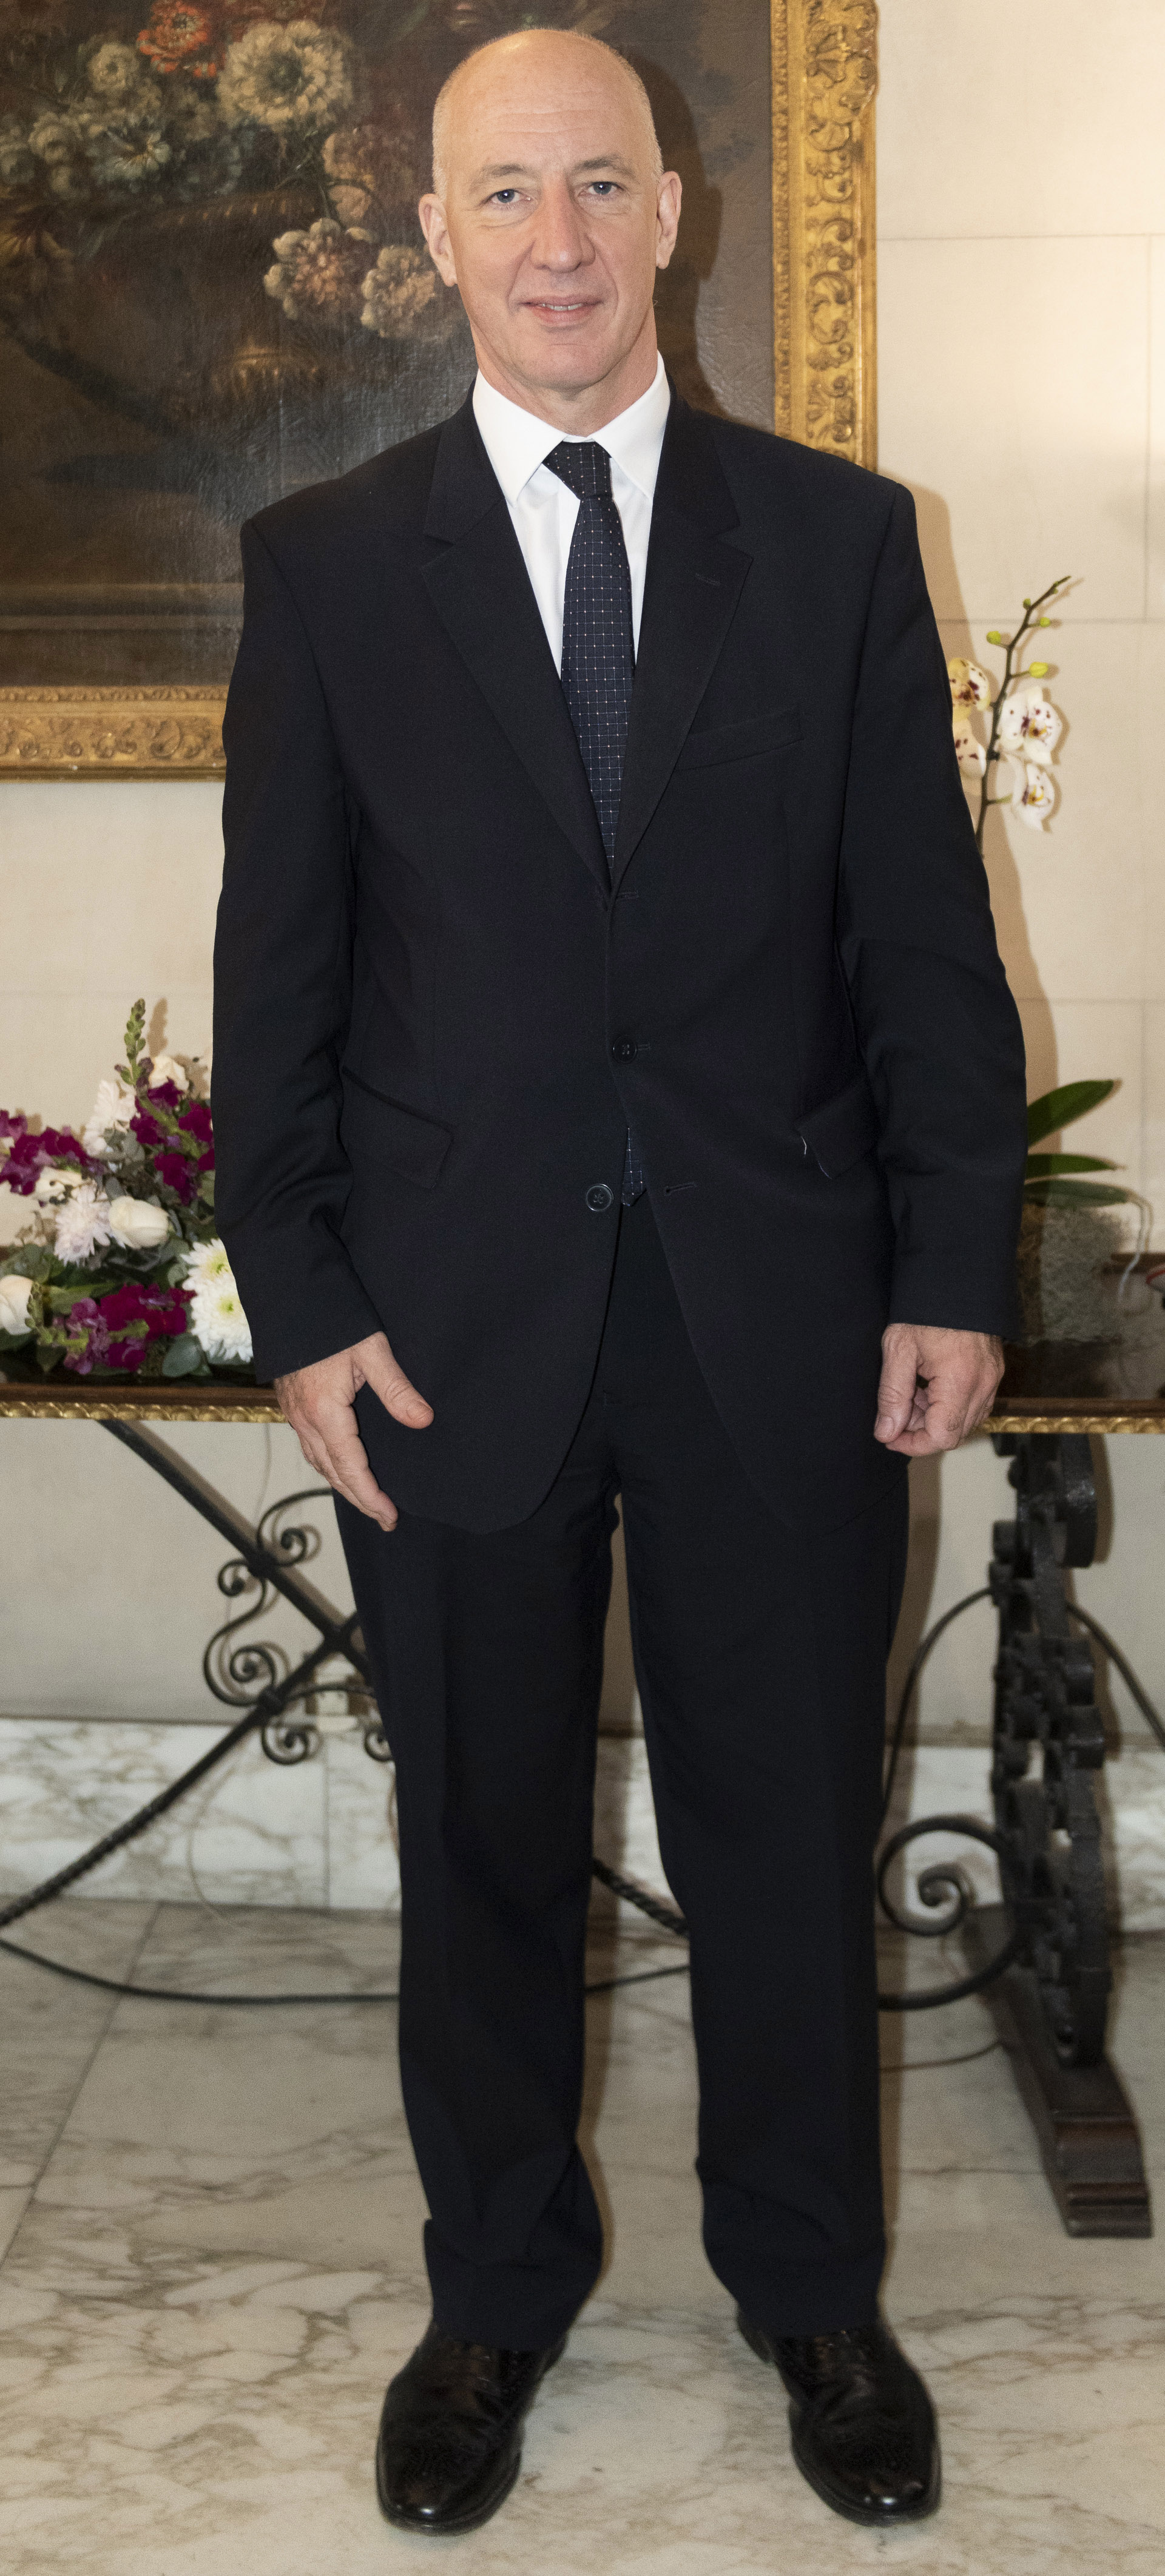 El embajador de Gran Bretaña, Mark Kent